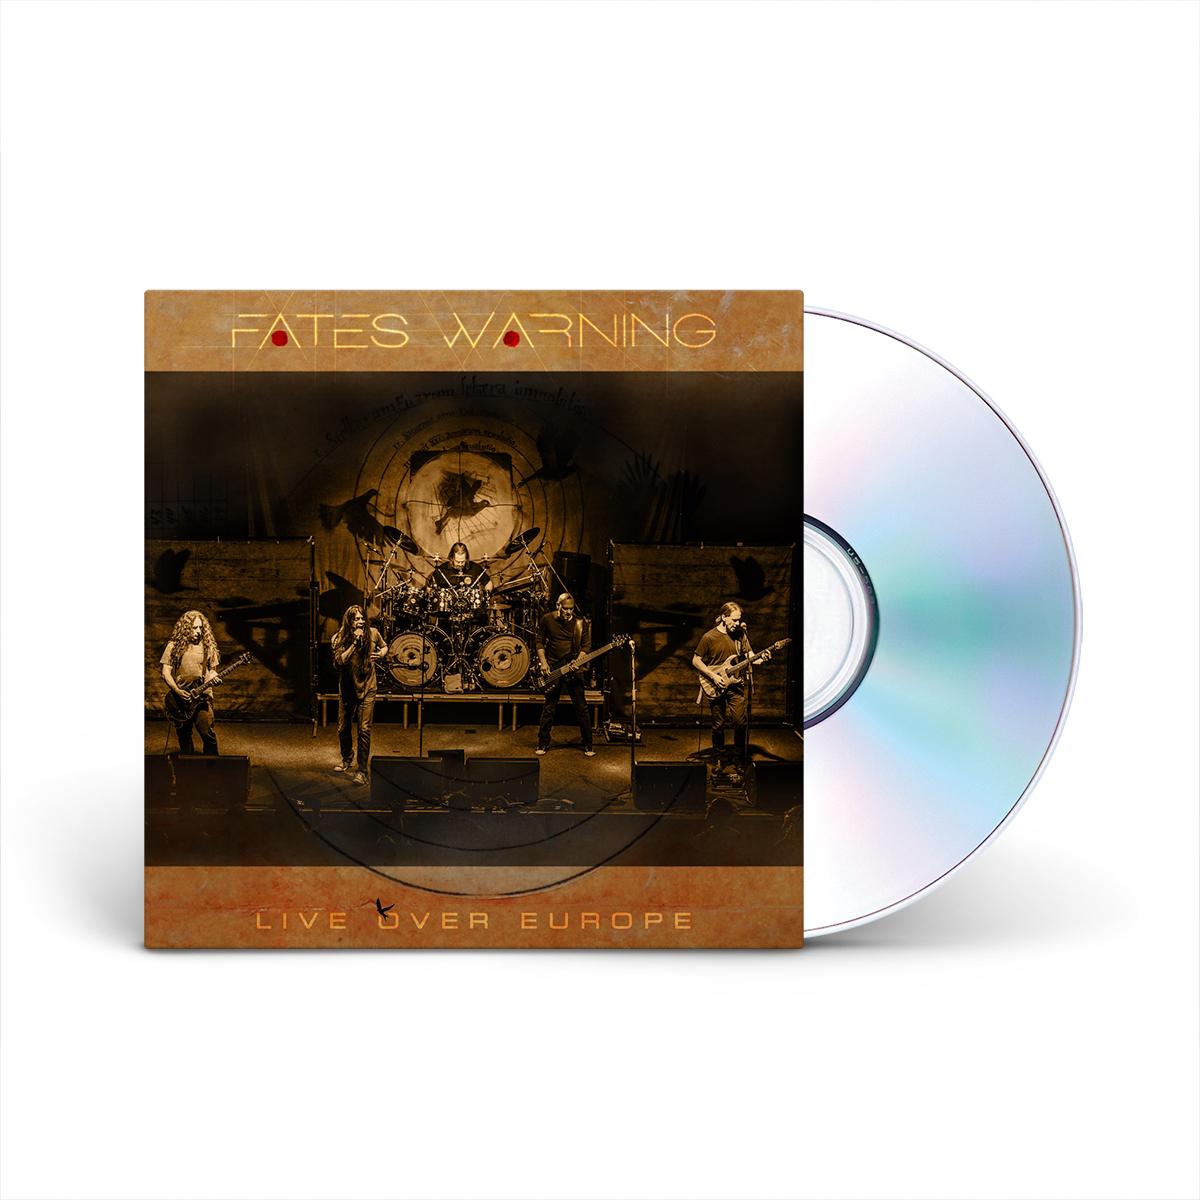 Fates Warning - Live Over Europe 2 CD Set